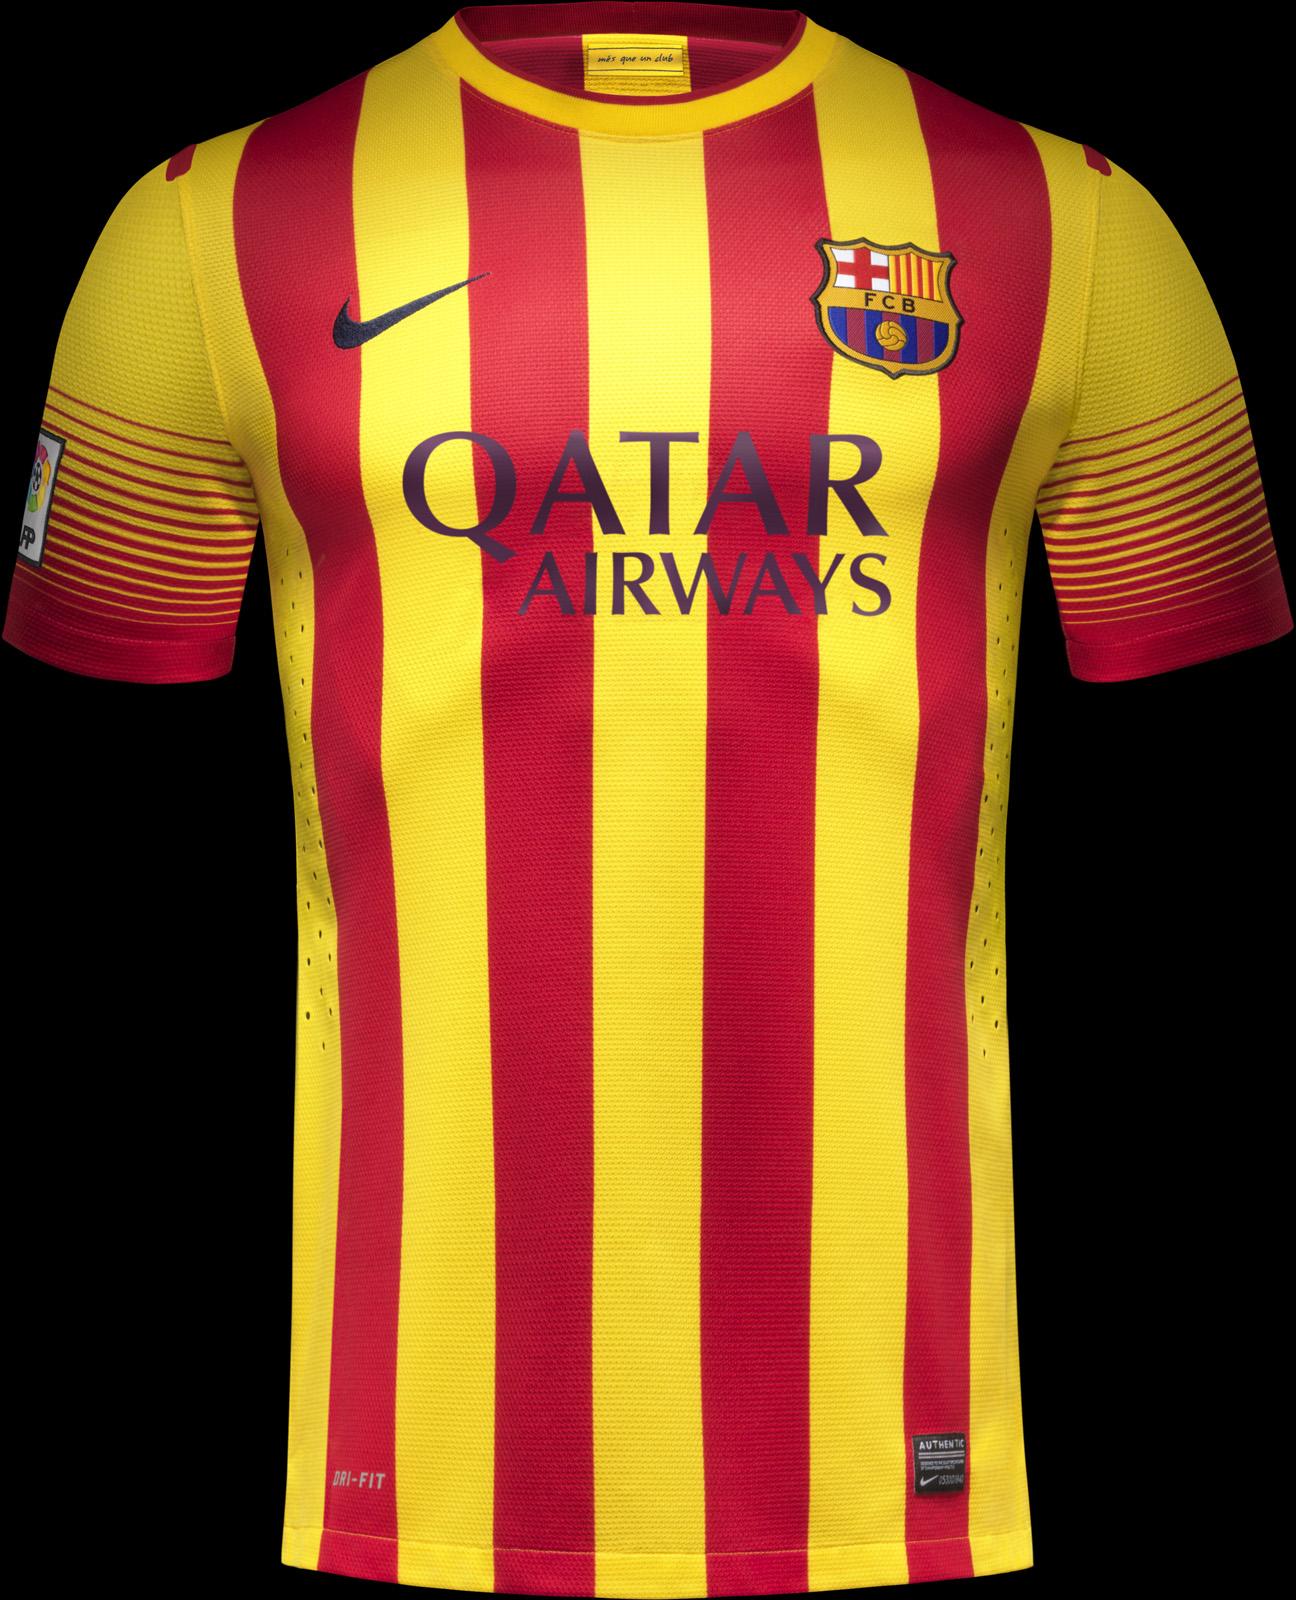 Fc barcelona 13 14 home away kits released third kit - New home barcelona ...